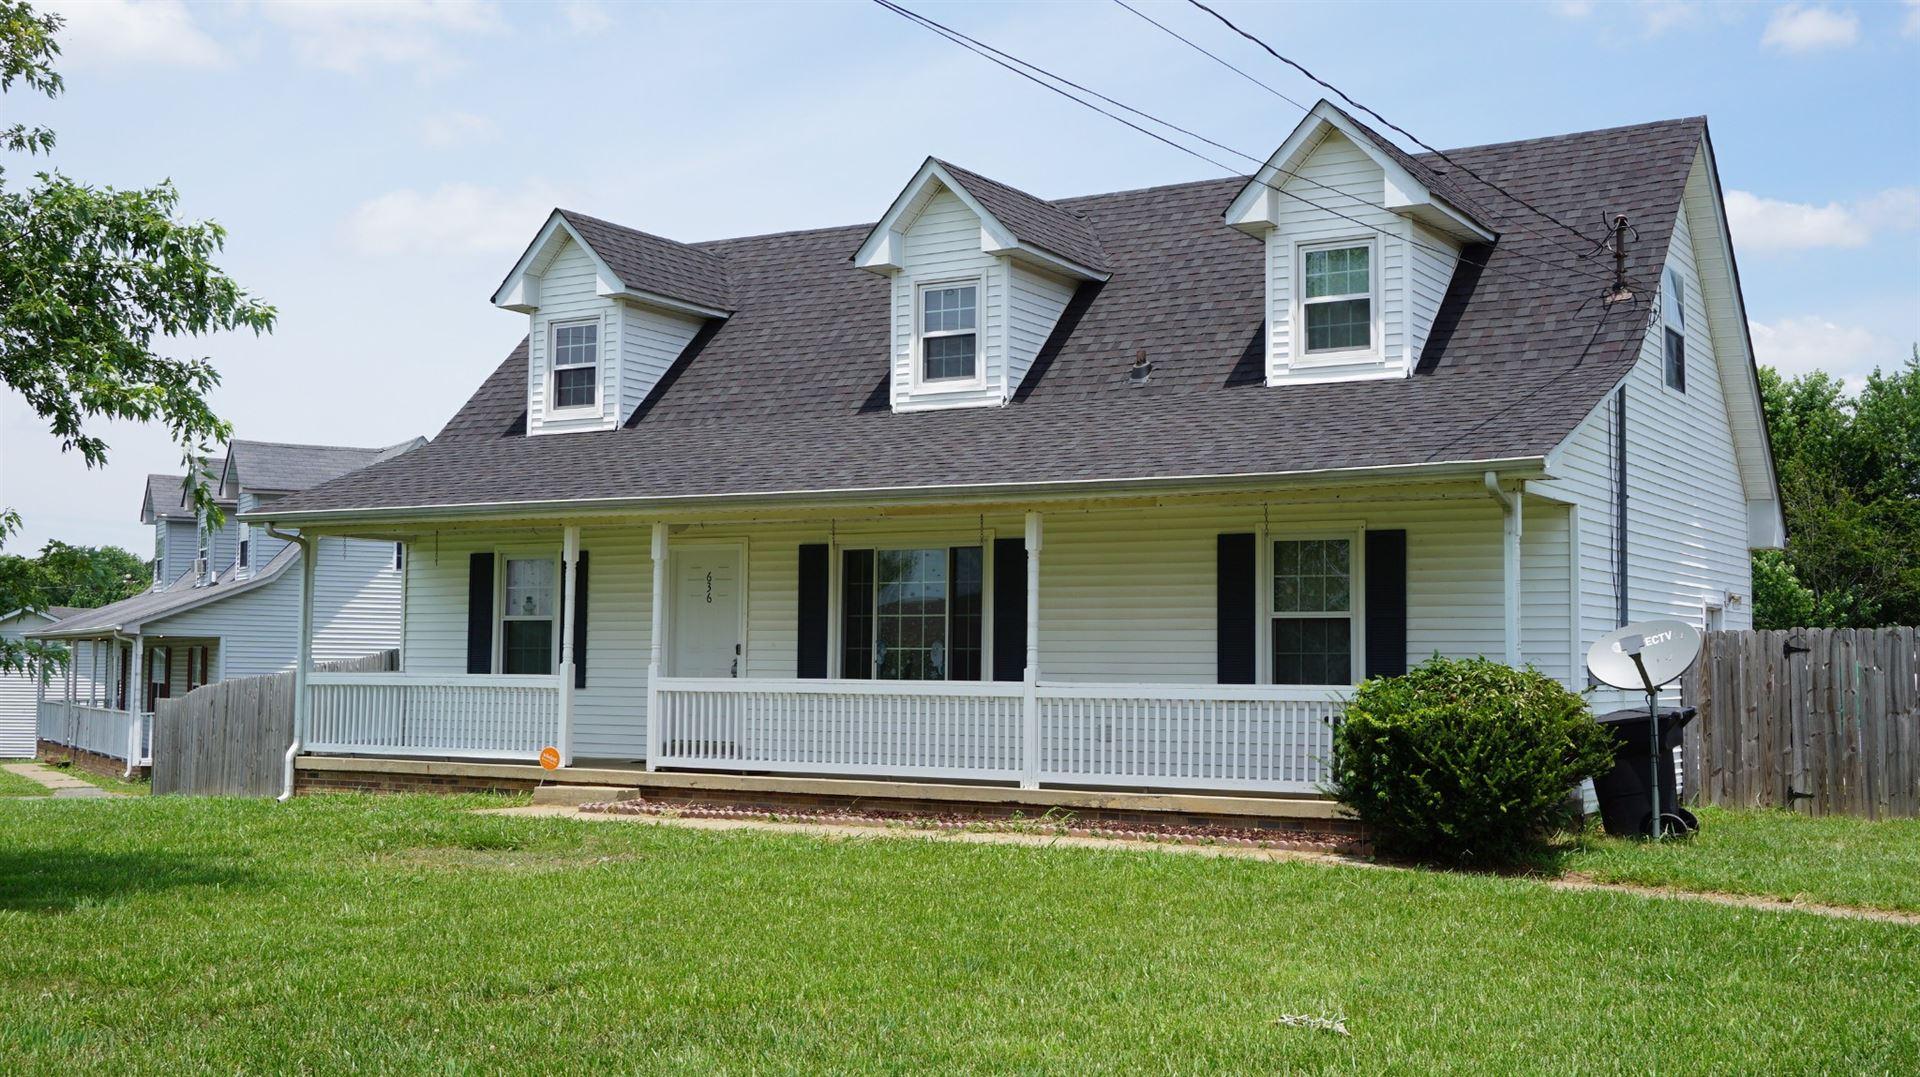 636 Hugh Hunter Rd, Oak Grove, KY 42262 - MLS#: 2266187